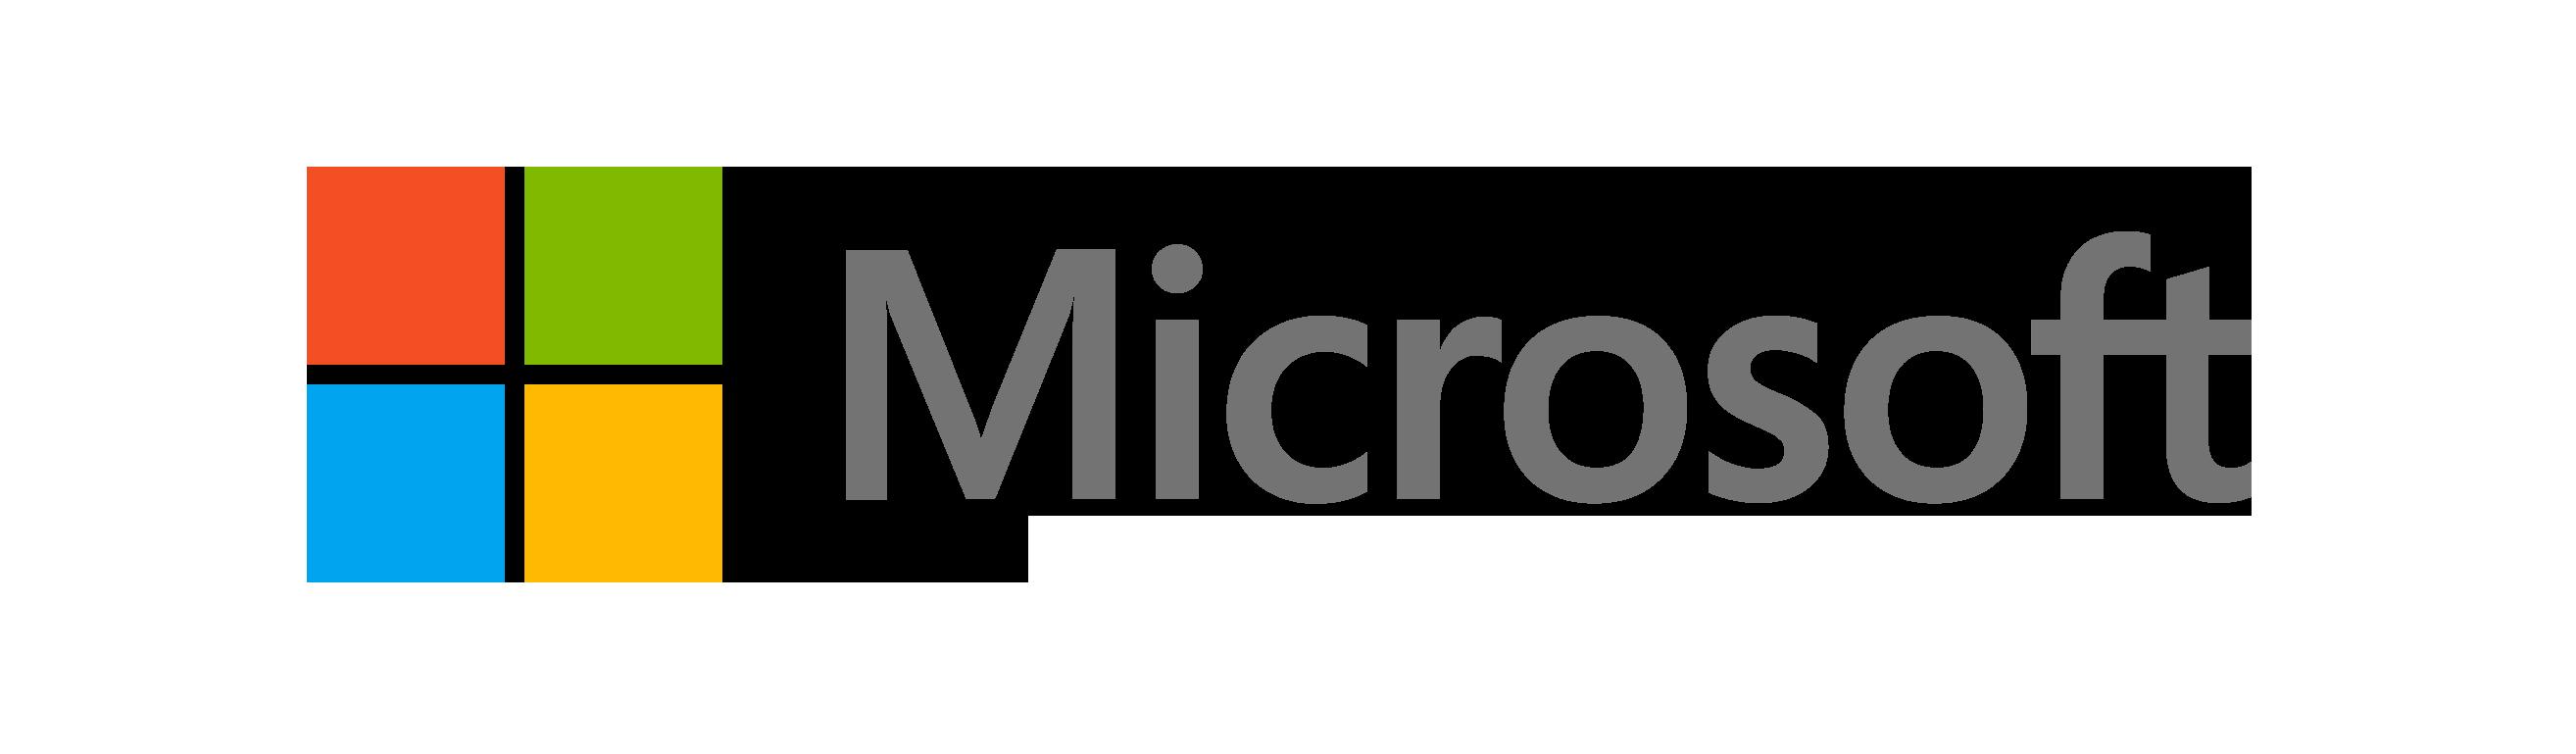 Microsoft-Logo_